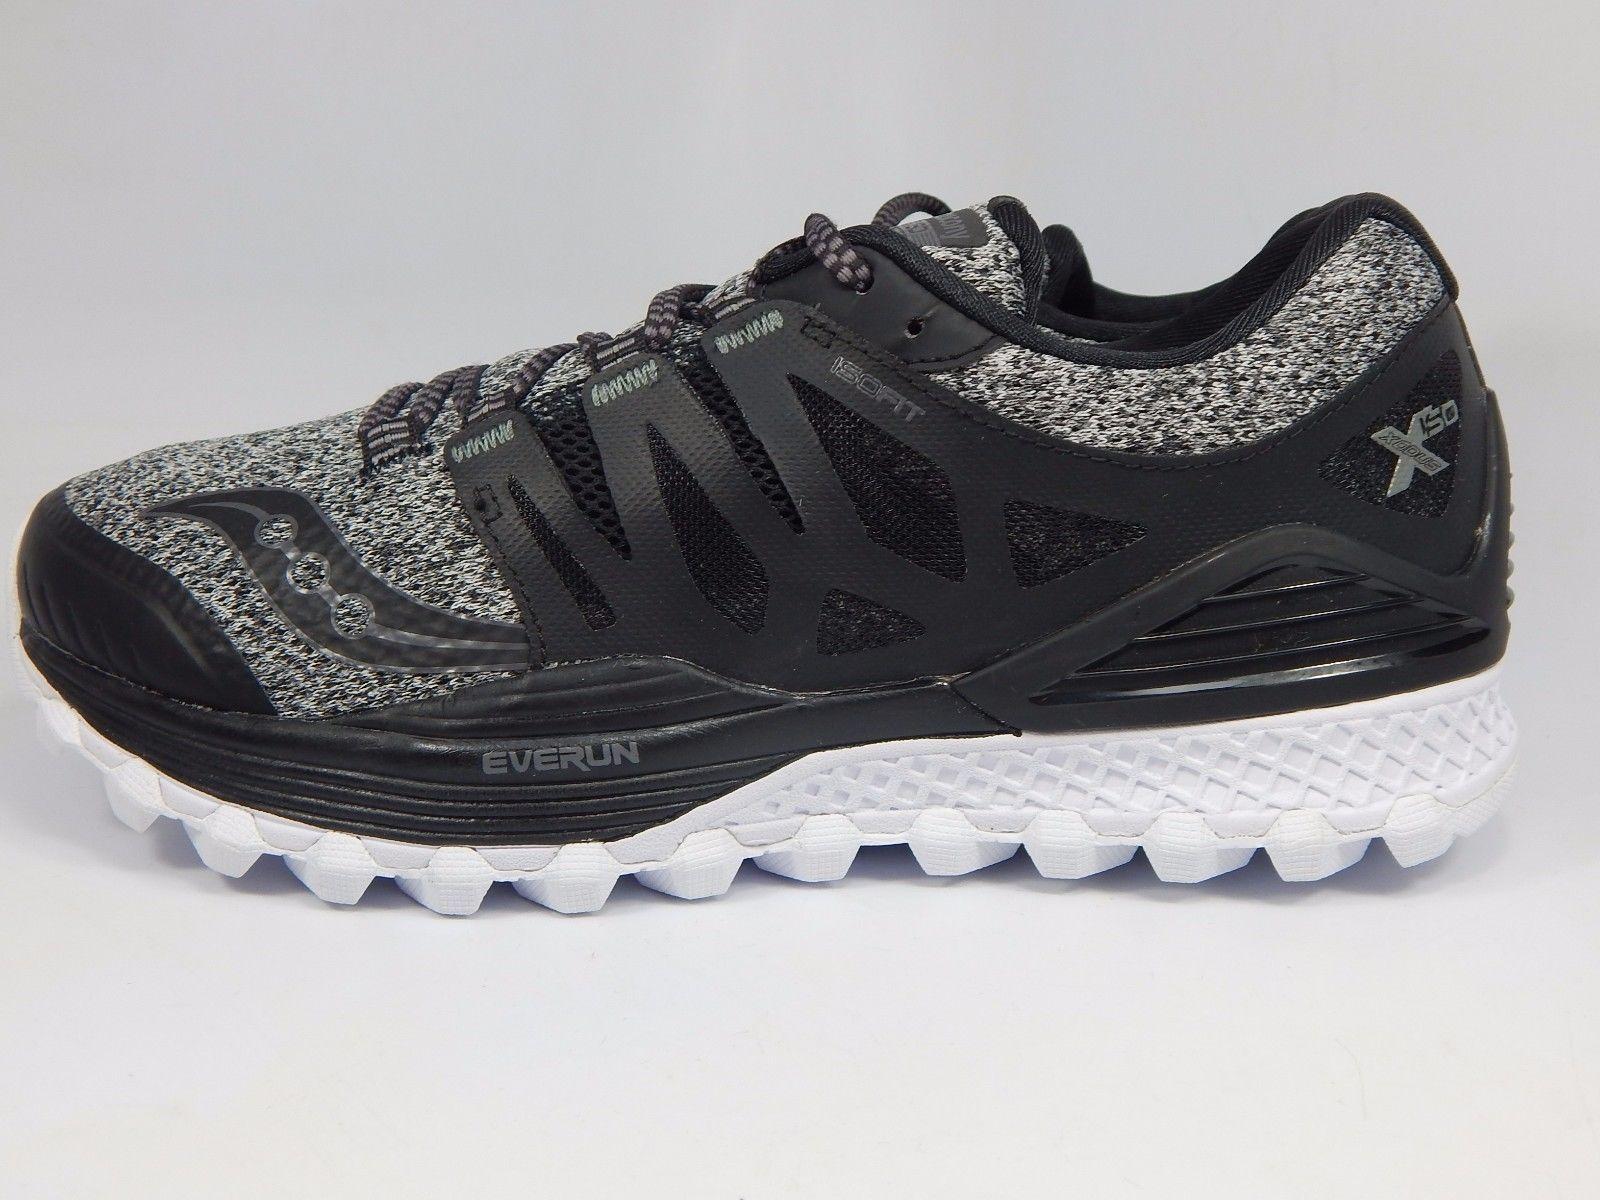 Saucony Xodus ISO LR Women's Trail Running Shoes Size US 8 M (B) EU 39 S10365-1